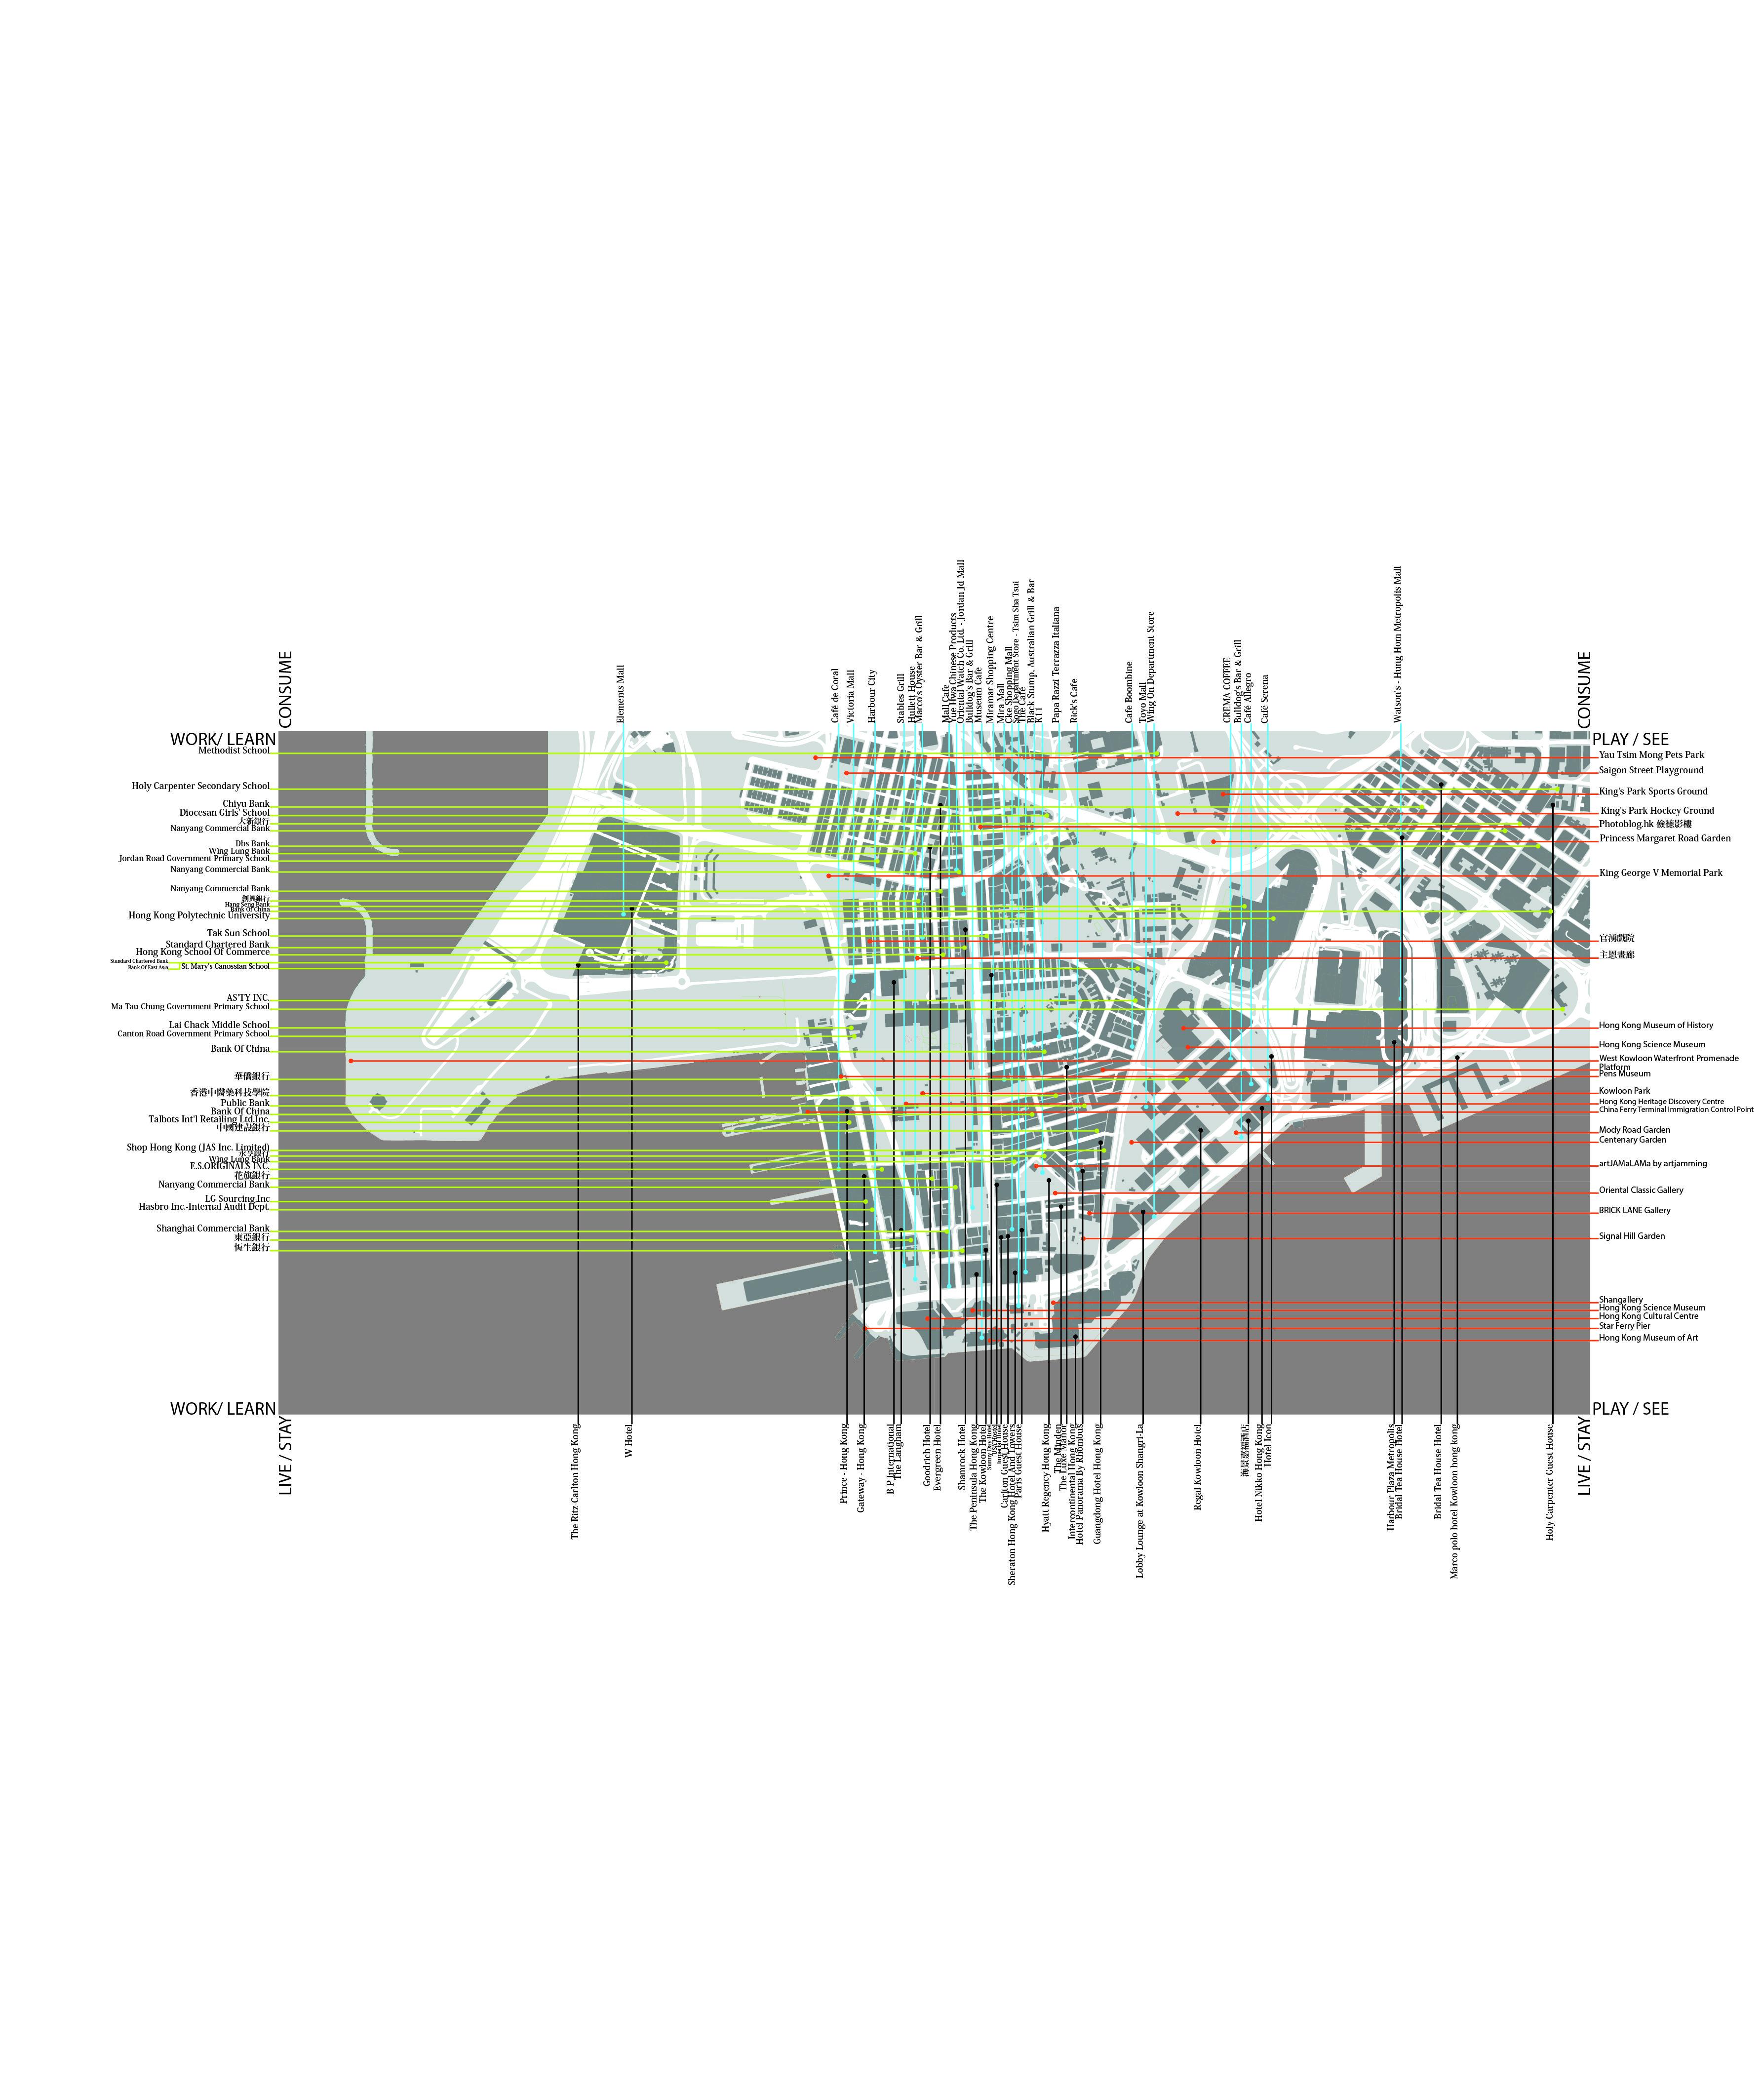 Urban planning phd thesis